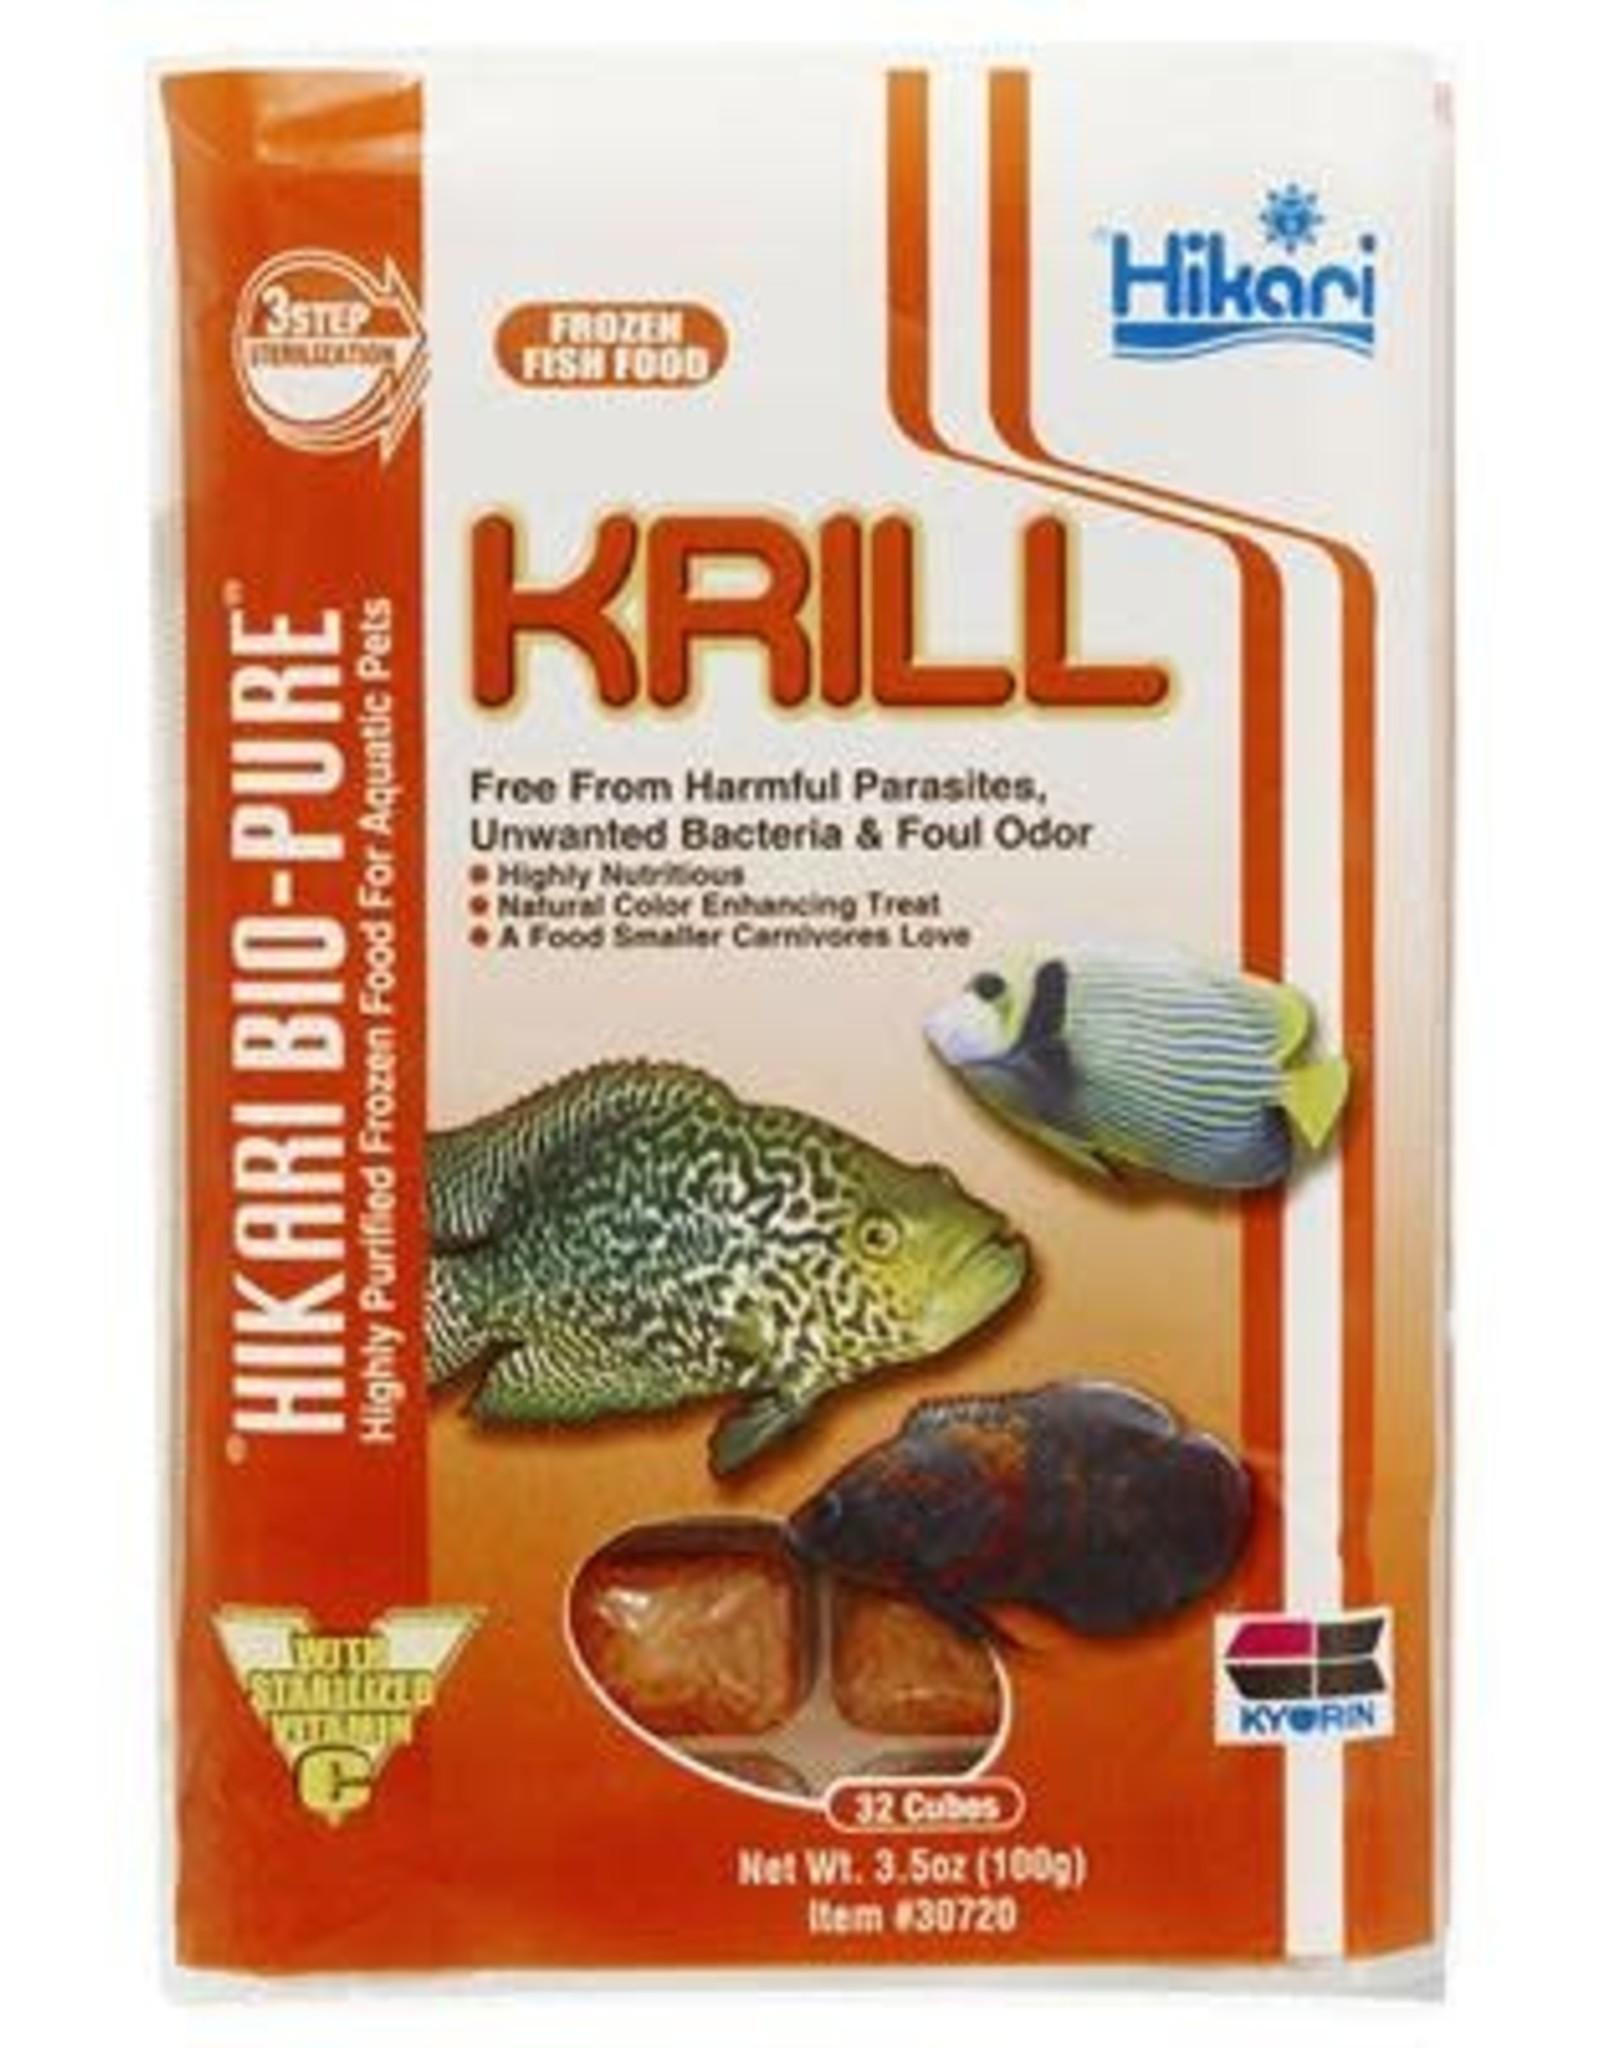 HIKARI USA INC. Frozen - Krill 3.5OZ Cube